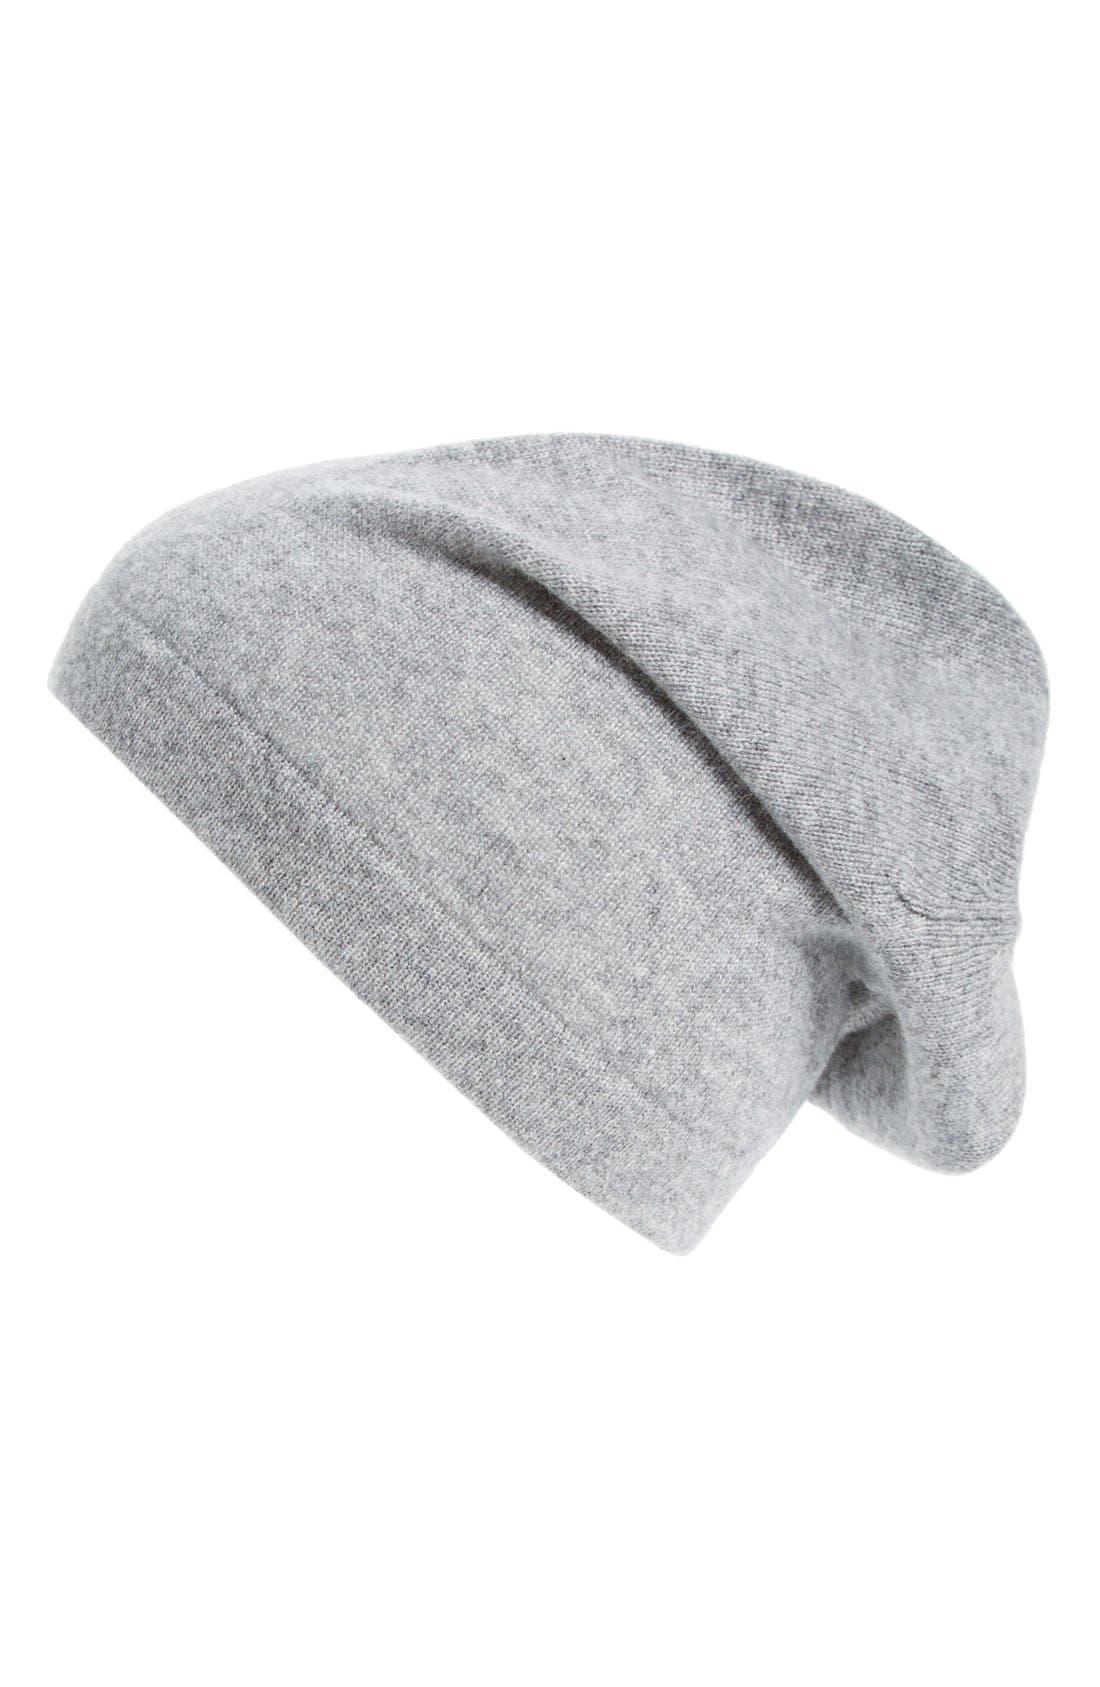 Cashmere Knit Cap,                         Main,                         color, Light Grey Heather